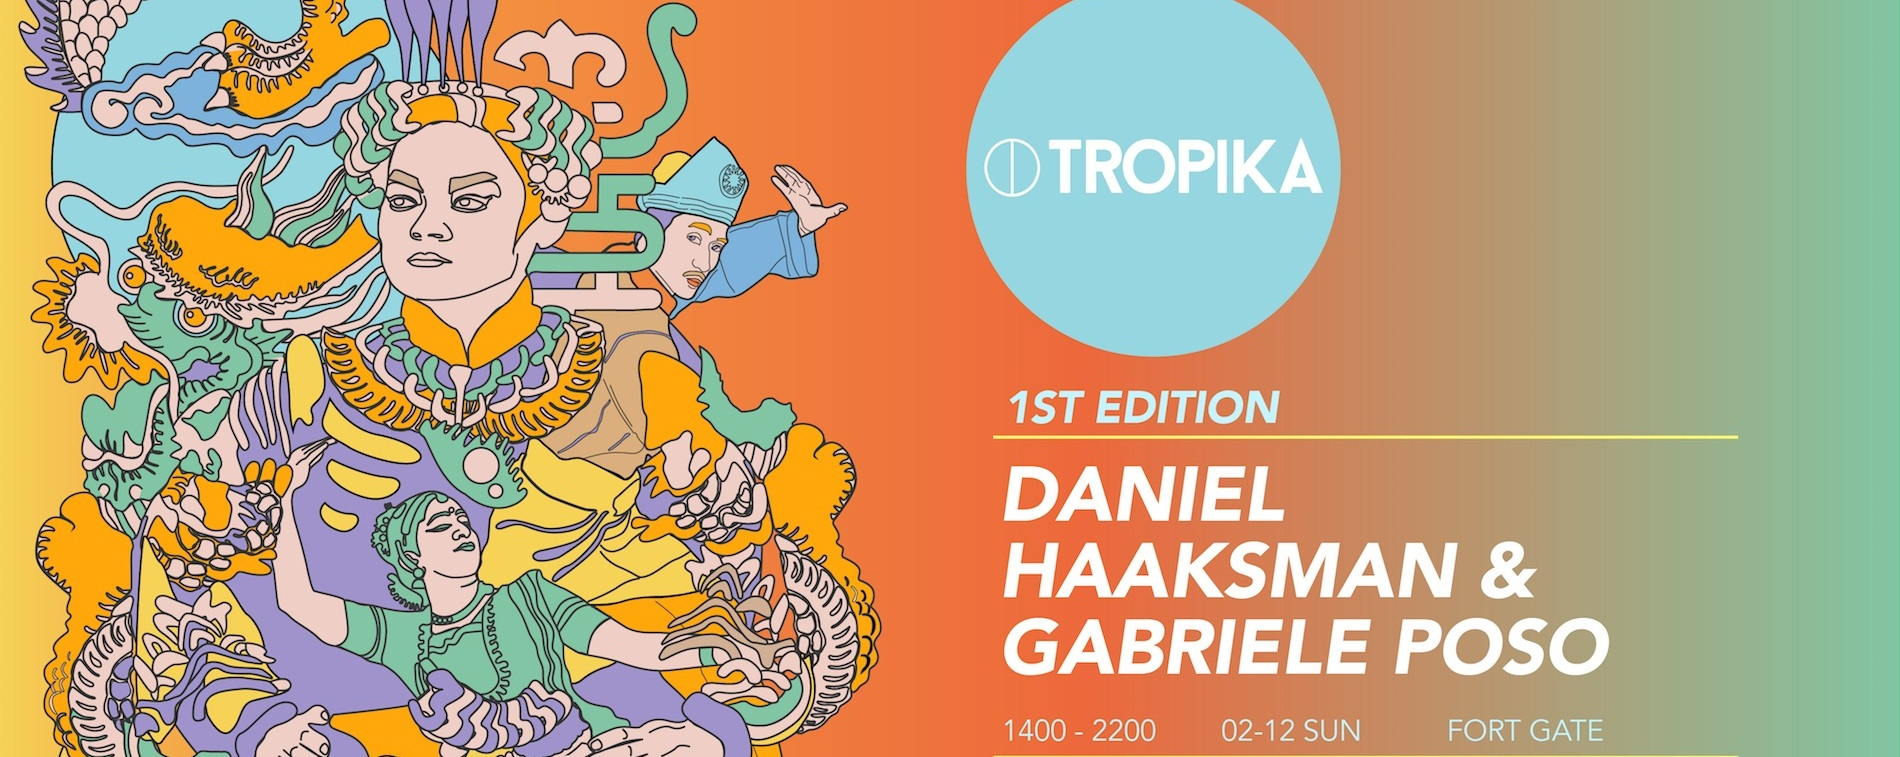 Tropika 1st Edition